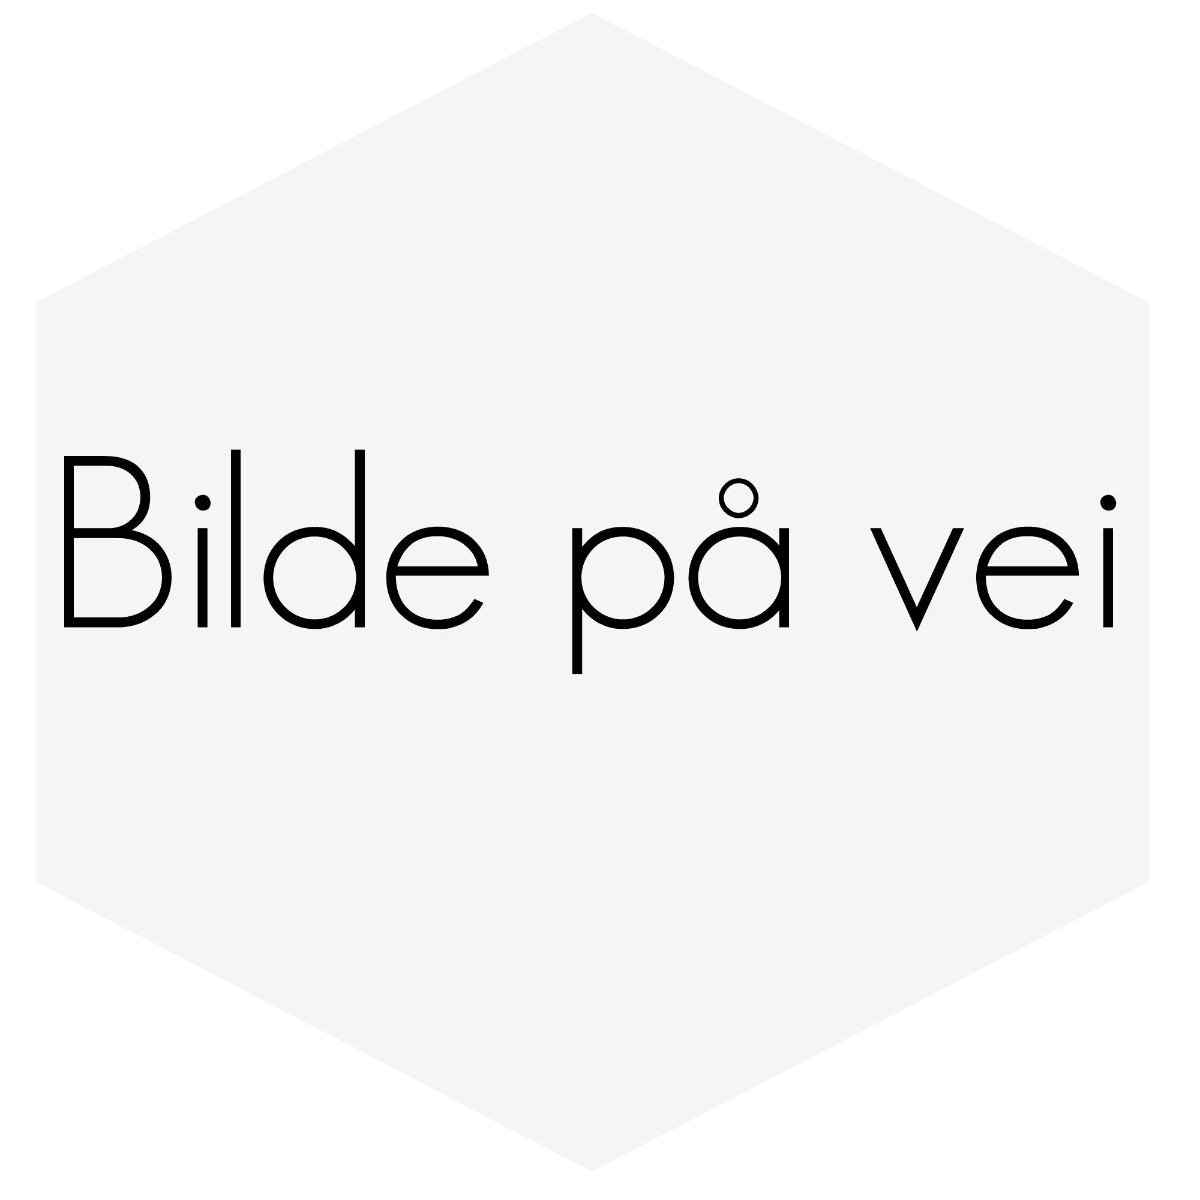 "SILIKONSLANGE RØD REDUSERING 2-3"" (51-76MM)"